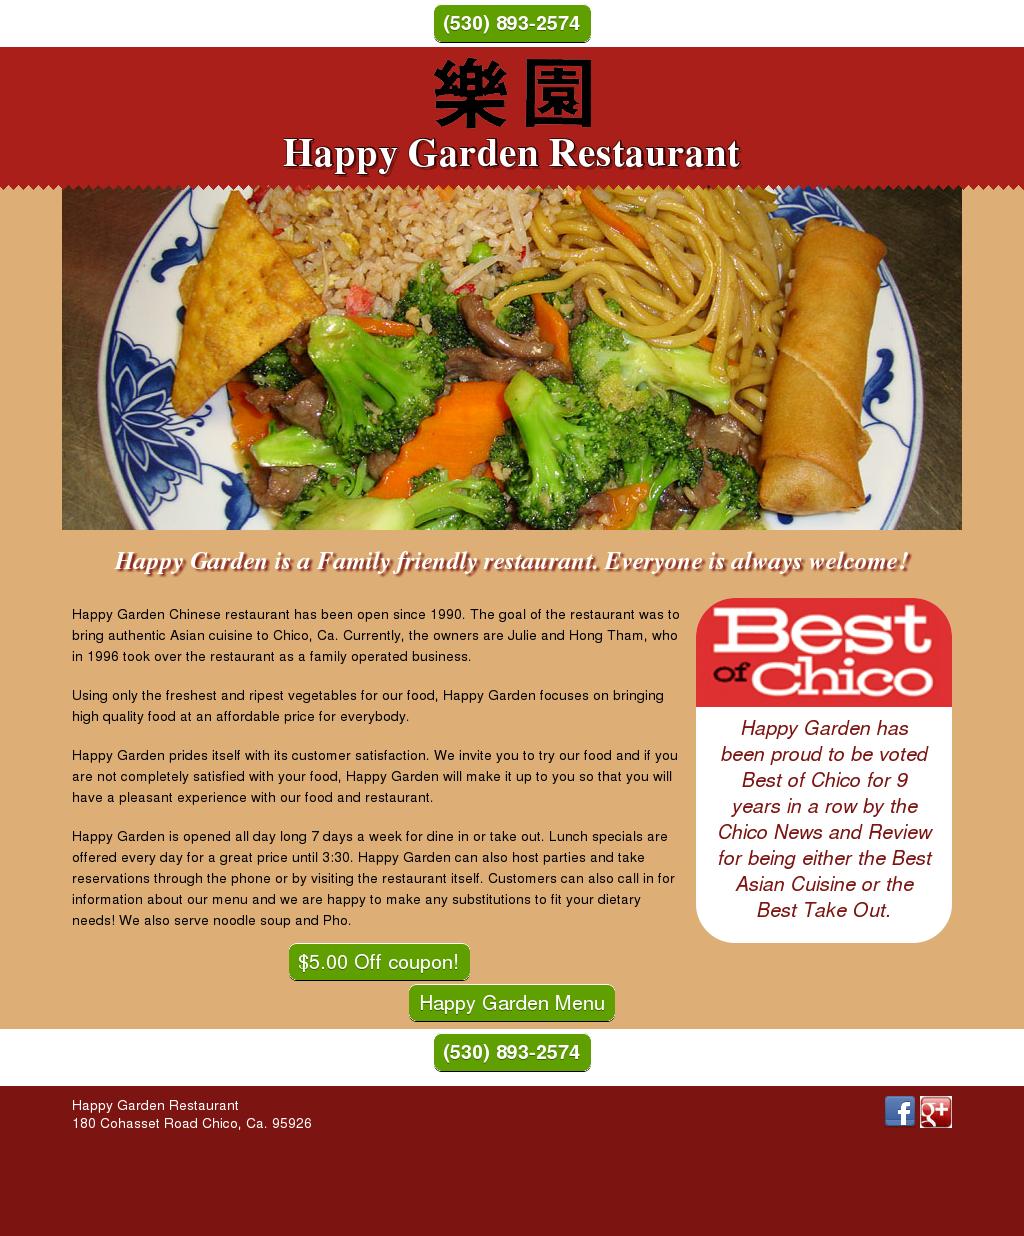 happy garden restaurant chico competitors revenue and employees owler company profile - Happy Garden Chico